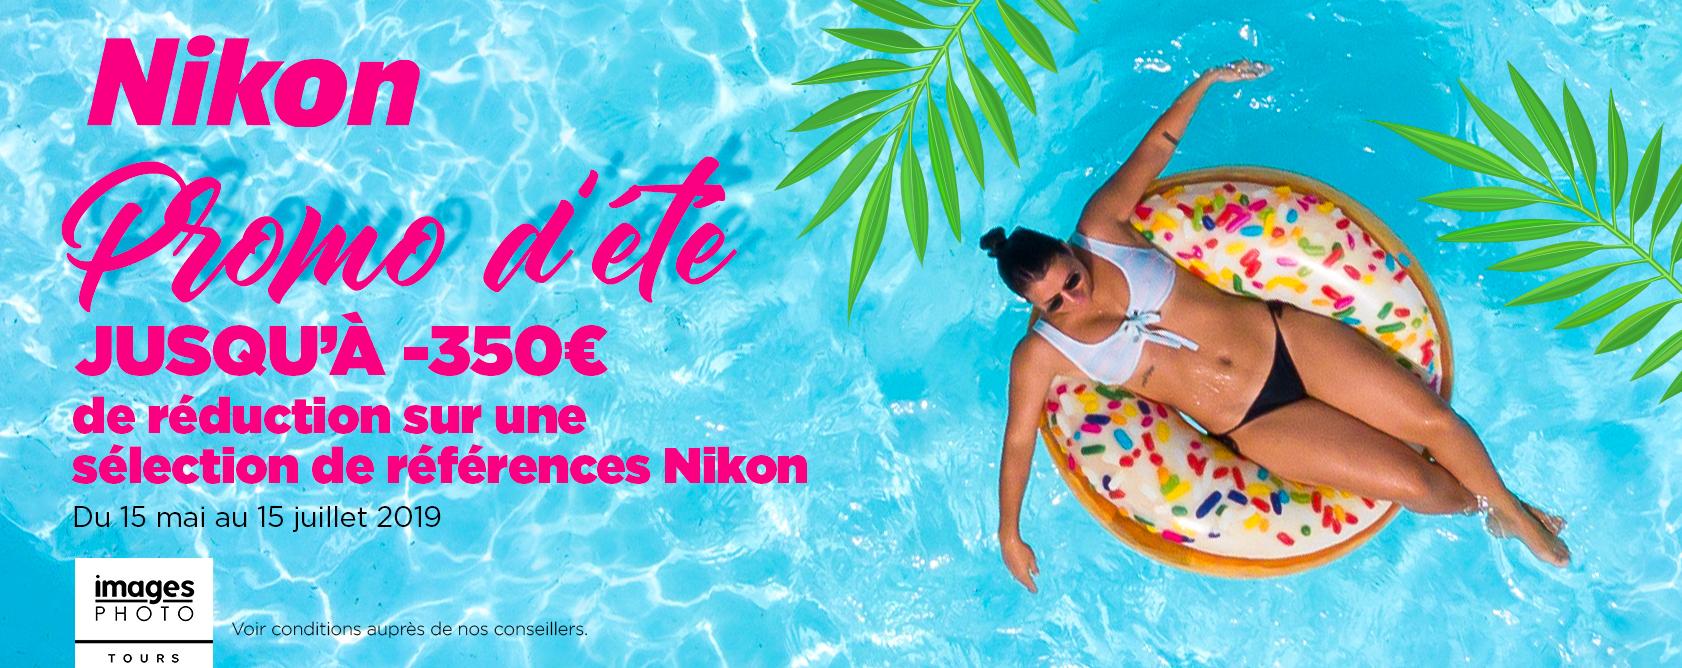 Nikon Promo été - Juillet 2019